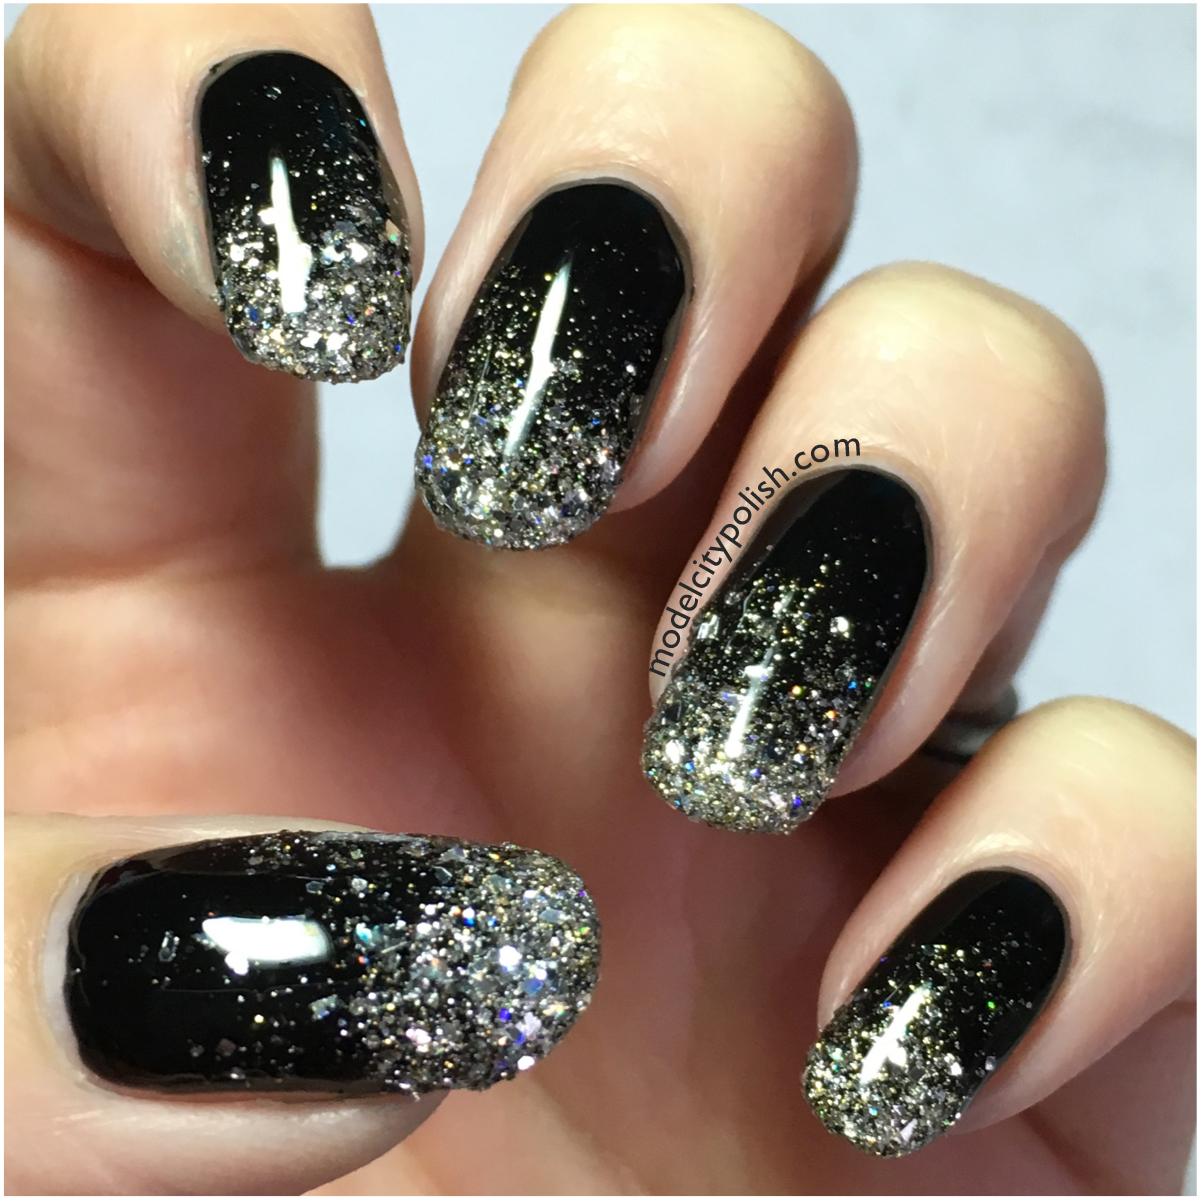 Diamonds Nail Art Design Ideas: Challenge Your Nail Art